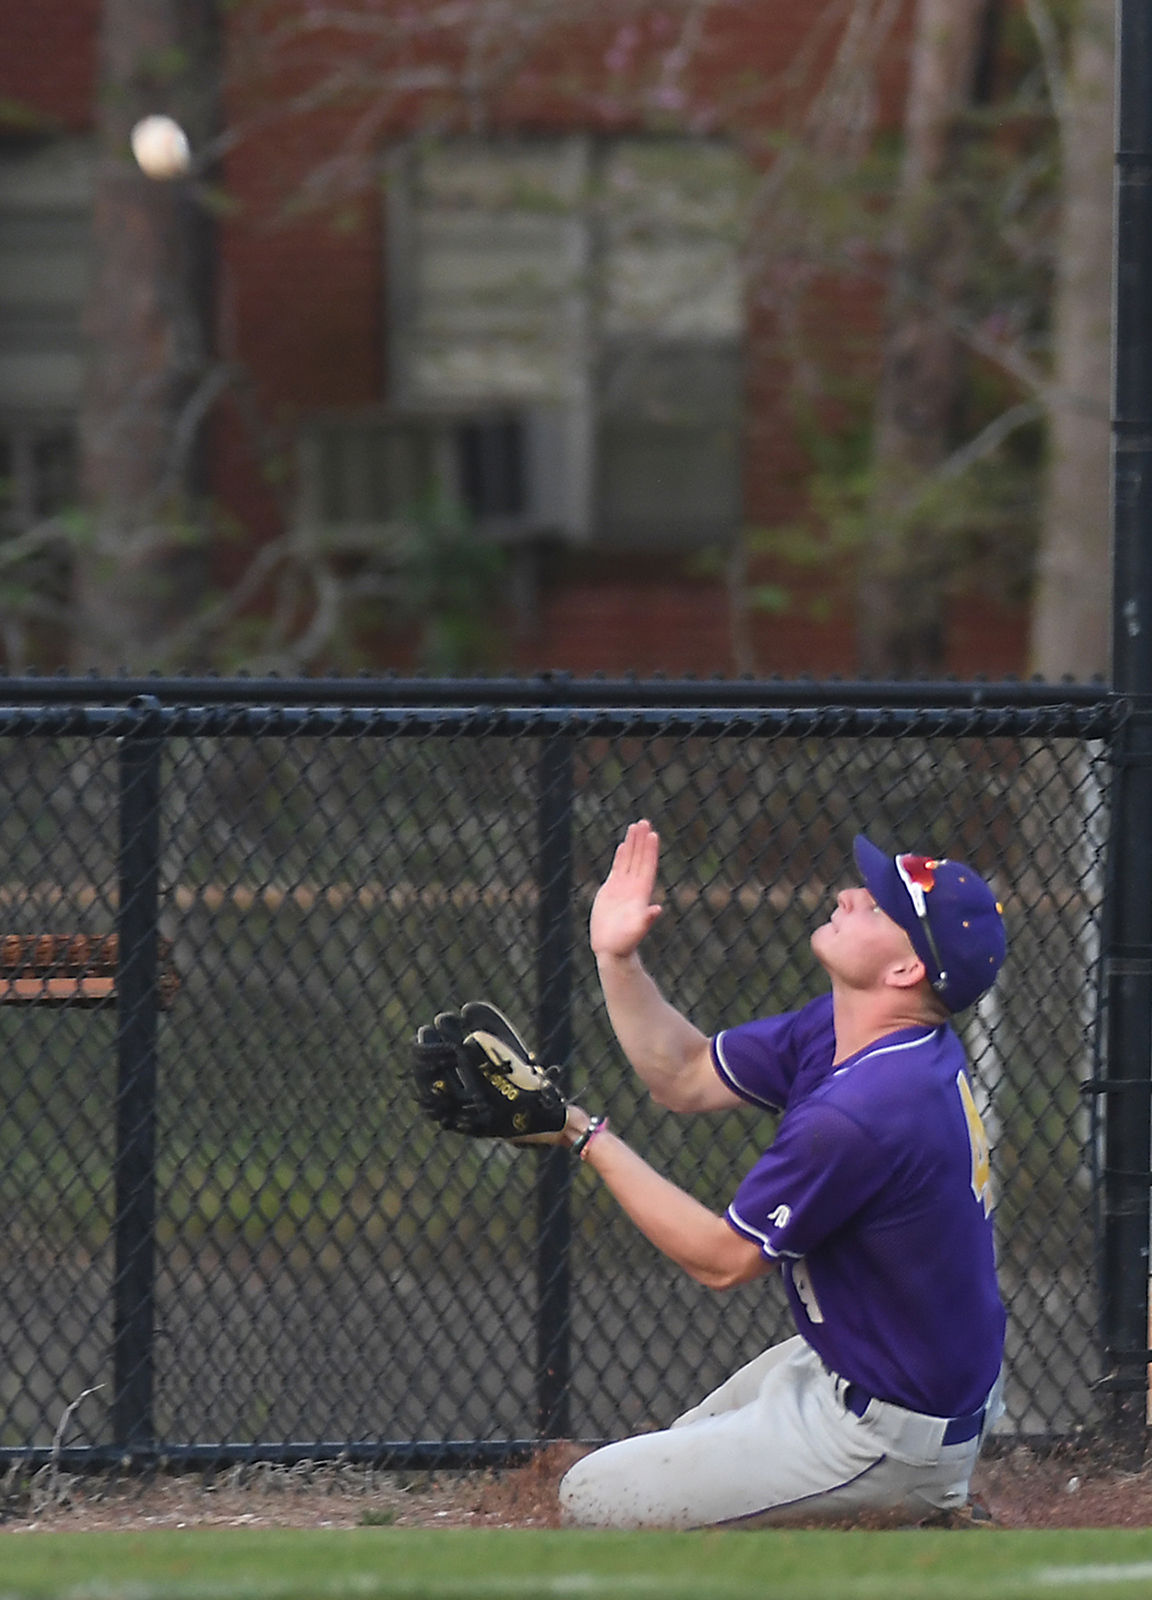 Denham Springs baseball vs. Catholic High: Cade Doughty